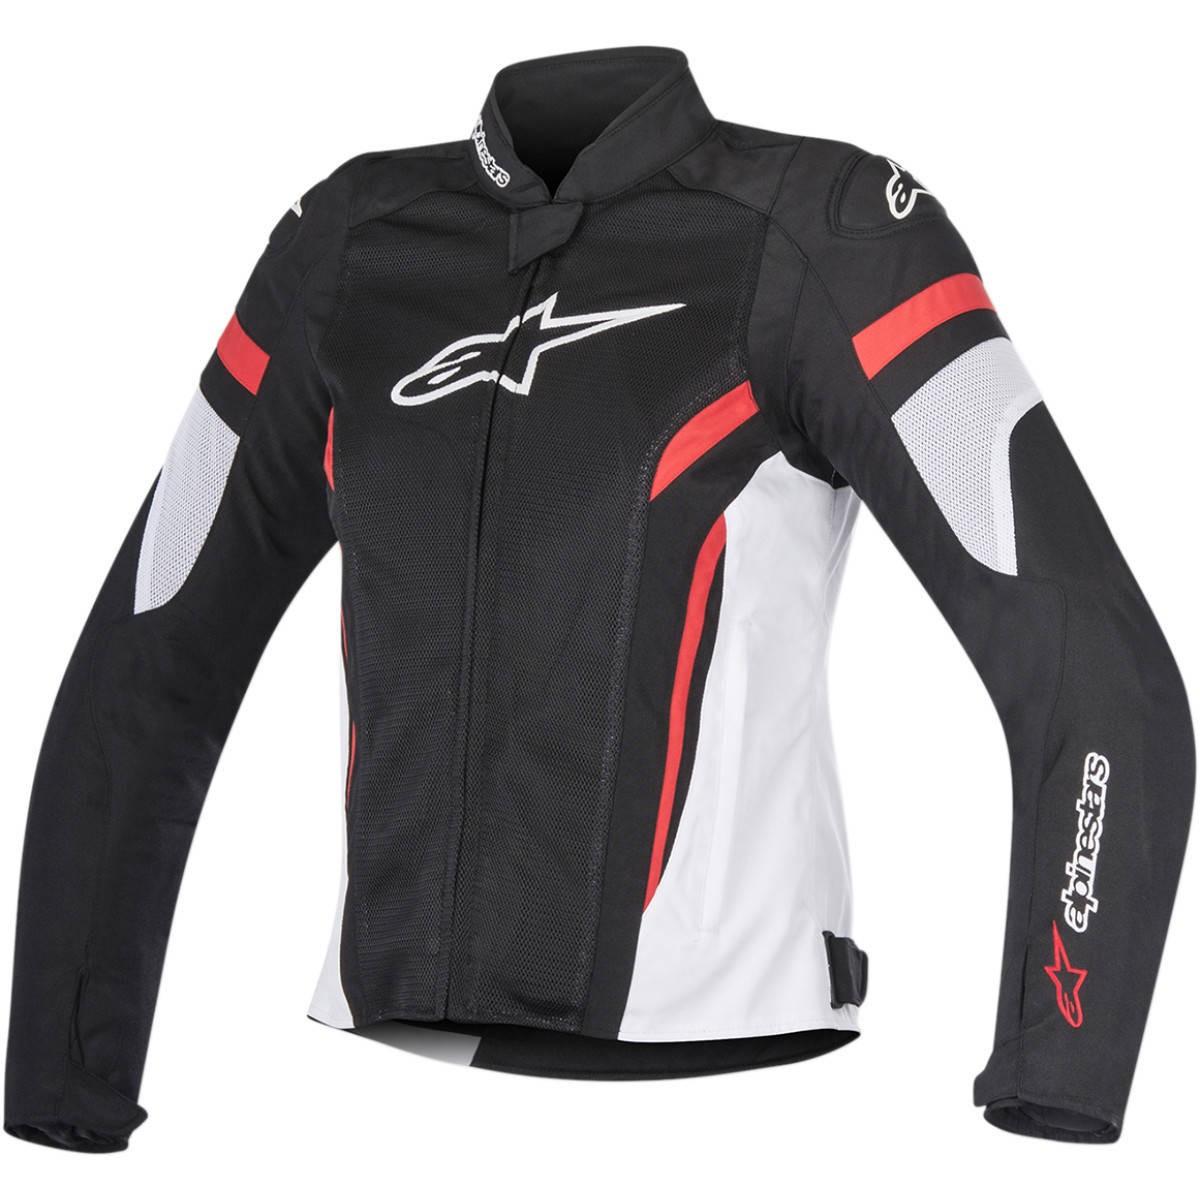 Jaqueta Alpinestars Stella T-GP Plus R Air V2  Preta/Vermelha/ Branca LANÇAMENTO!  - Planet Bike Shop Moto Acessórios